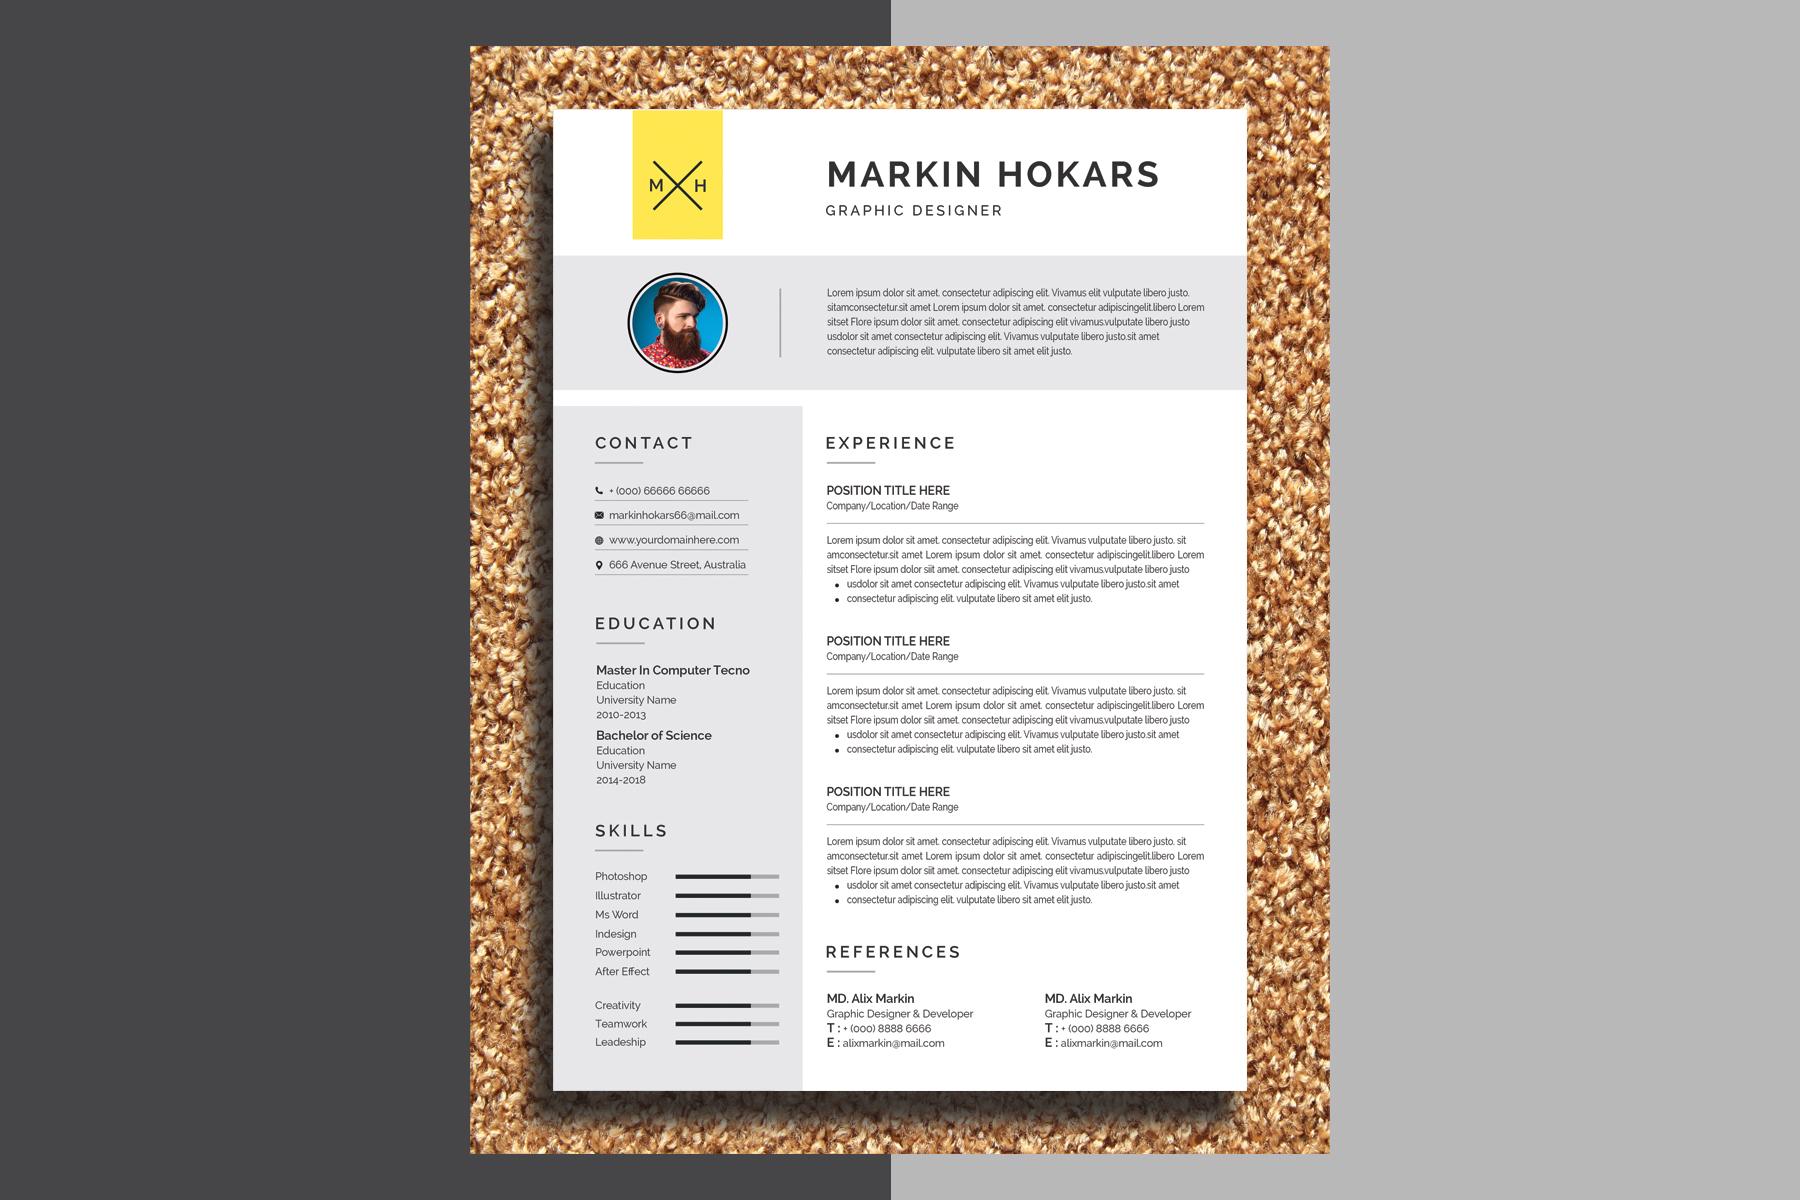 Markin Hokars Modern Resume Template